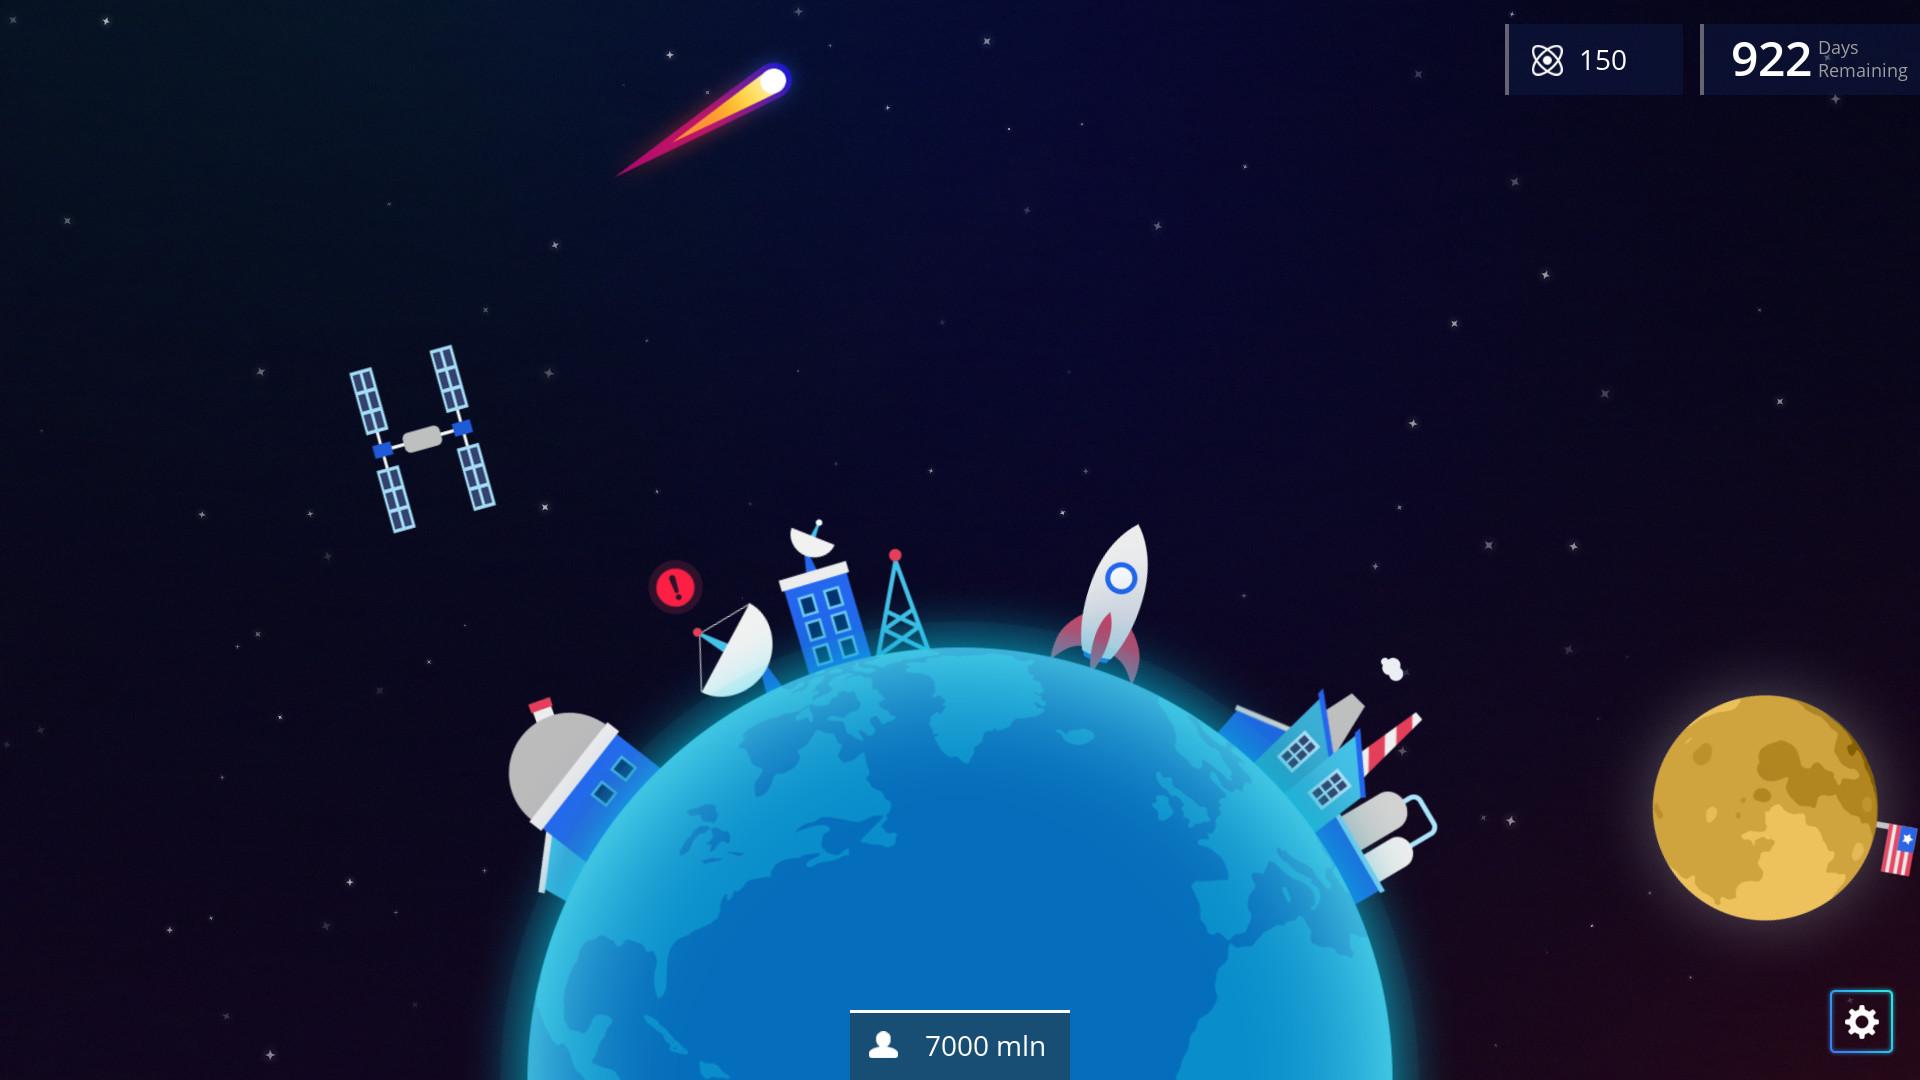 Things go a bit Interstellar in survival sim 1000 days to escape